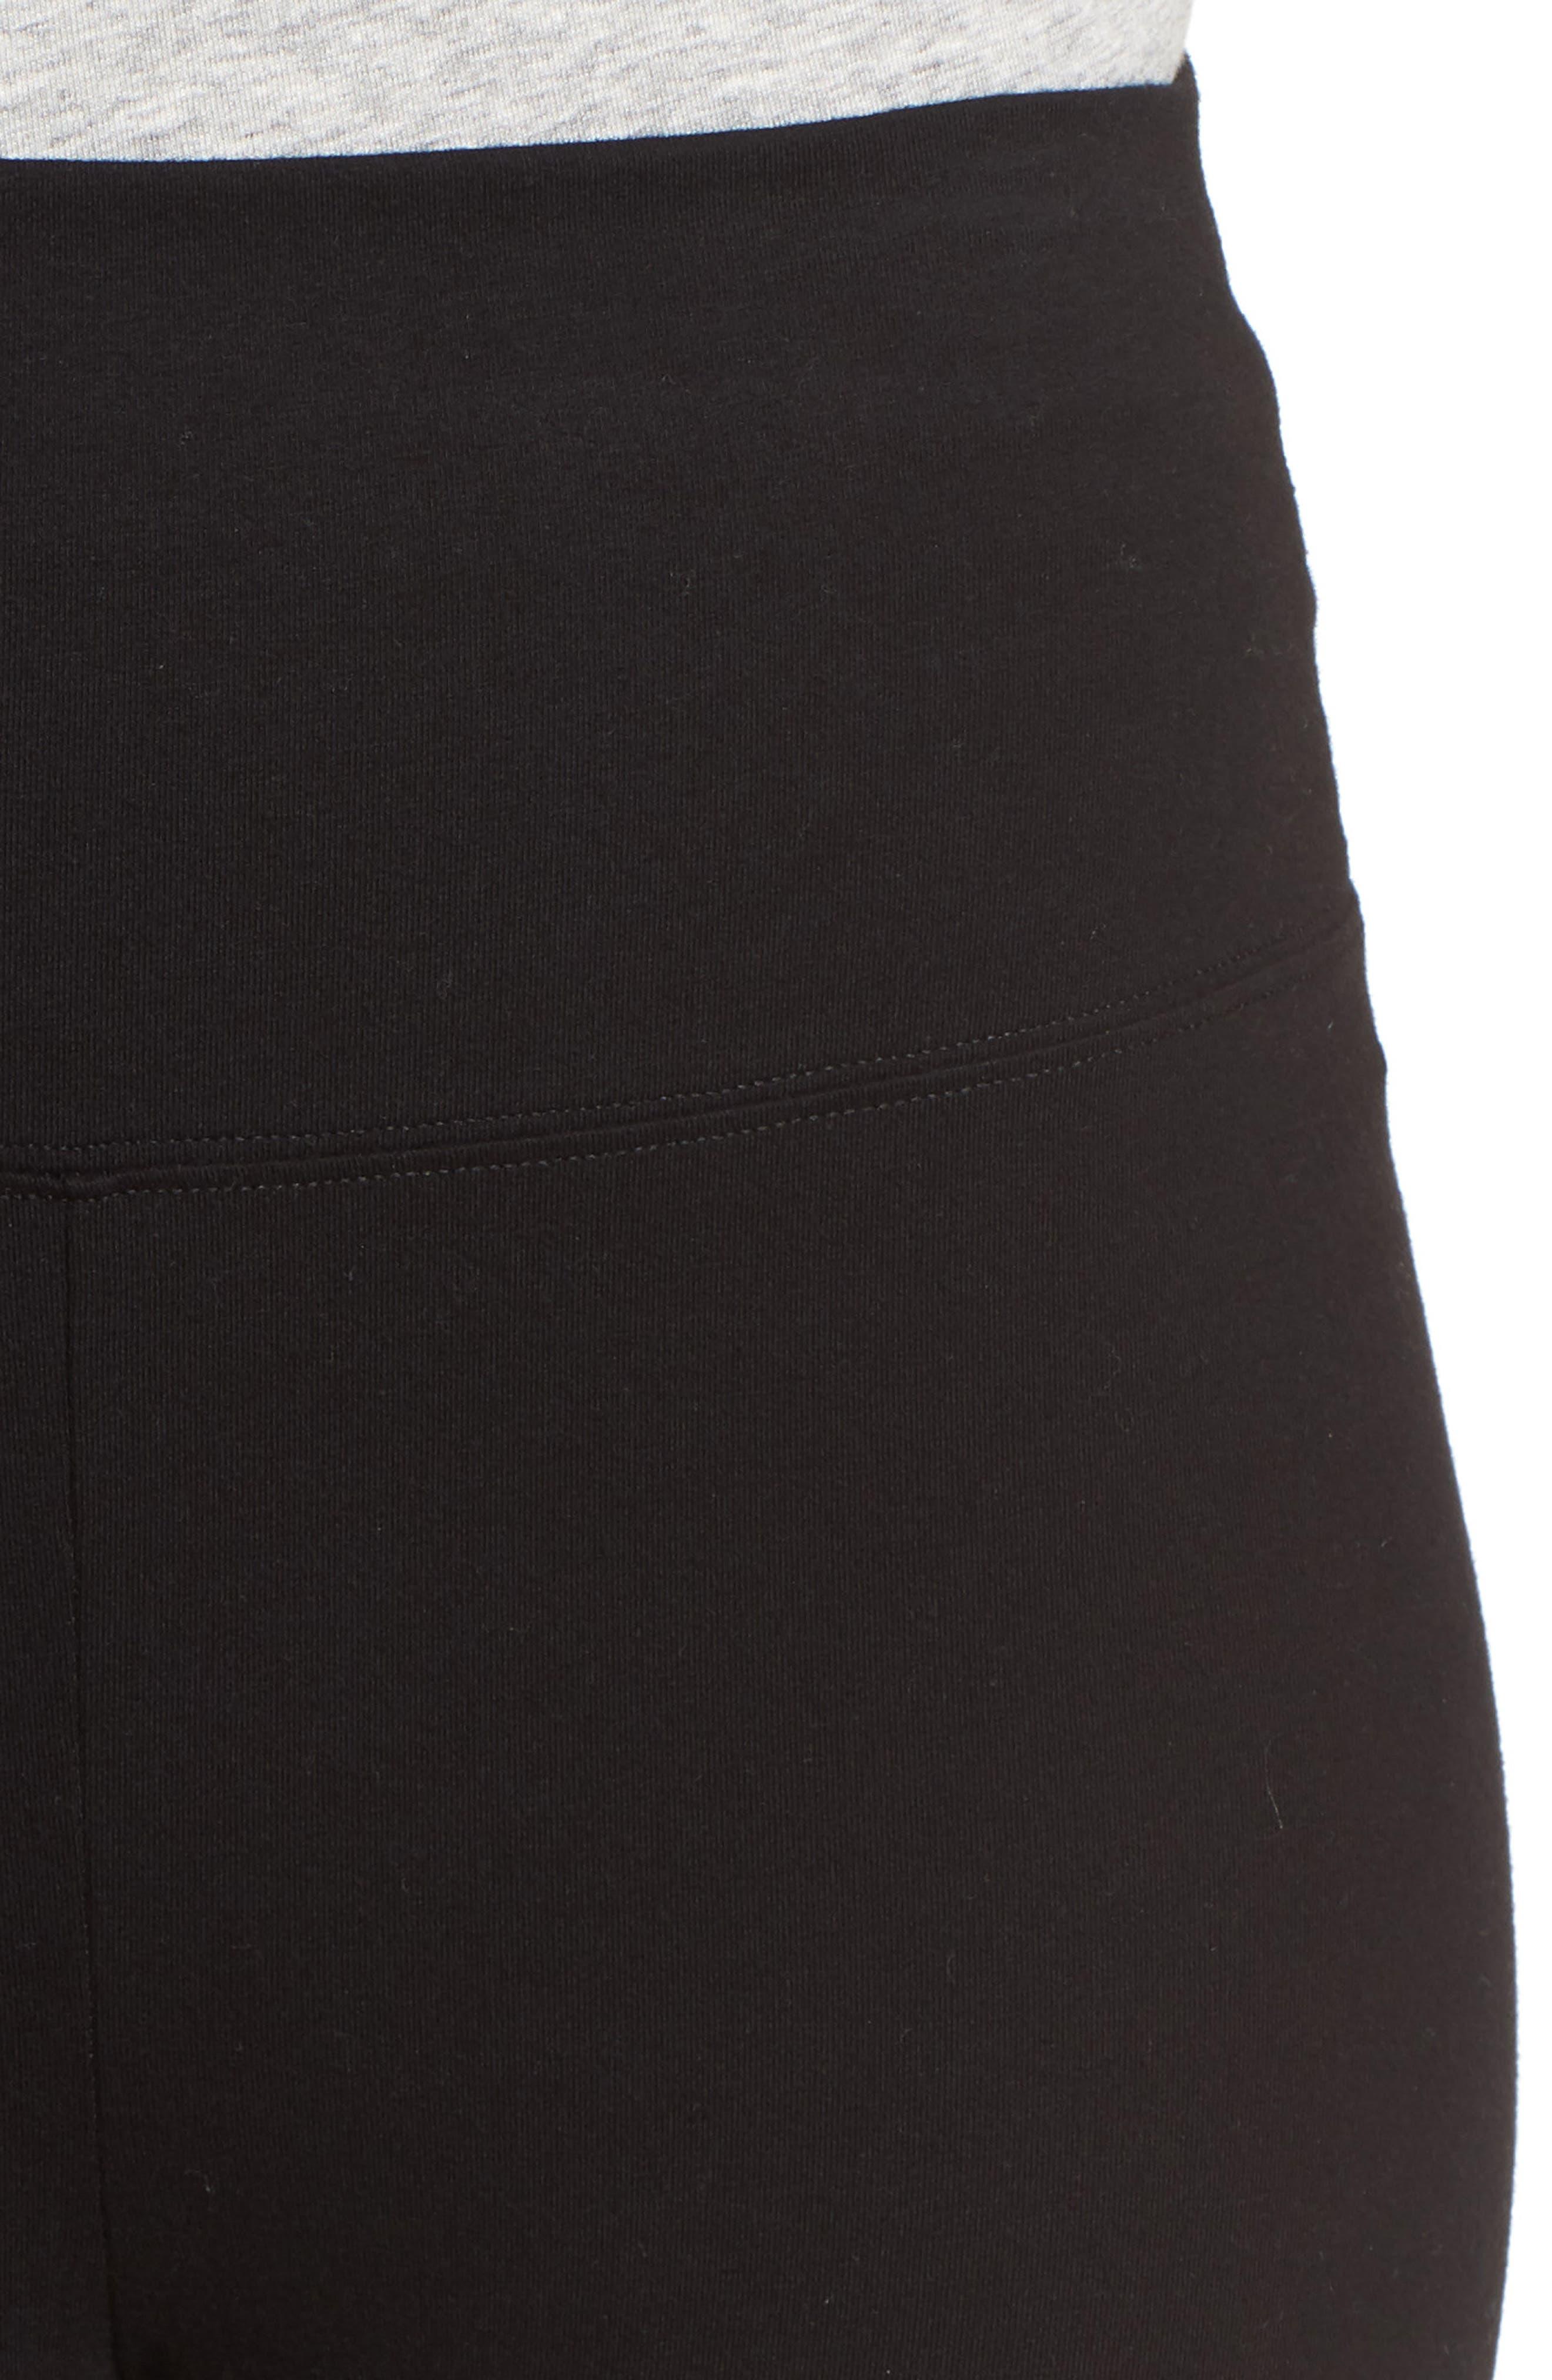 High Waist Crop Leggings,                             Alternate thumbnail 4, color,                             Black